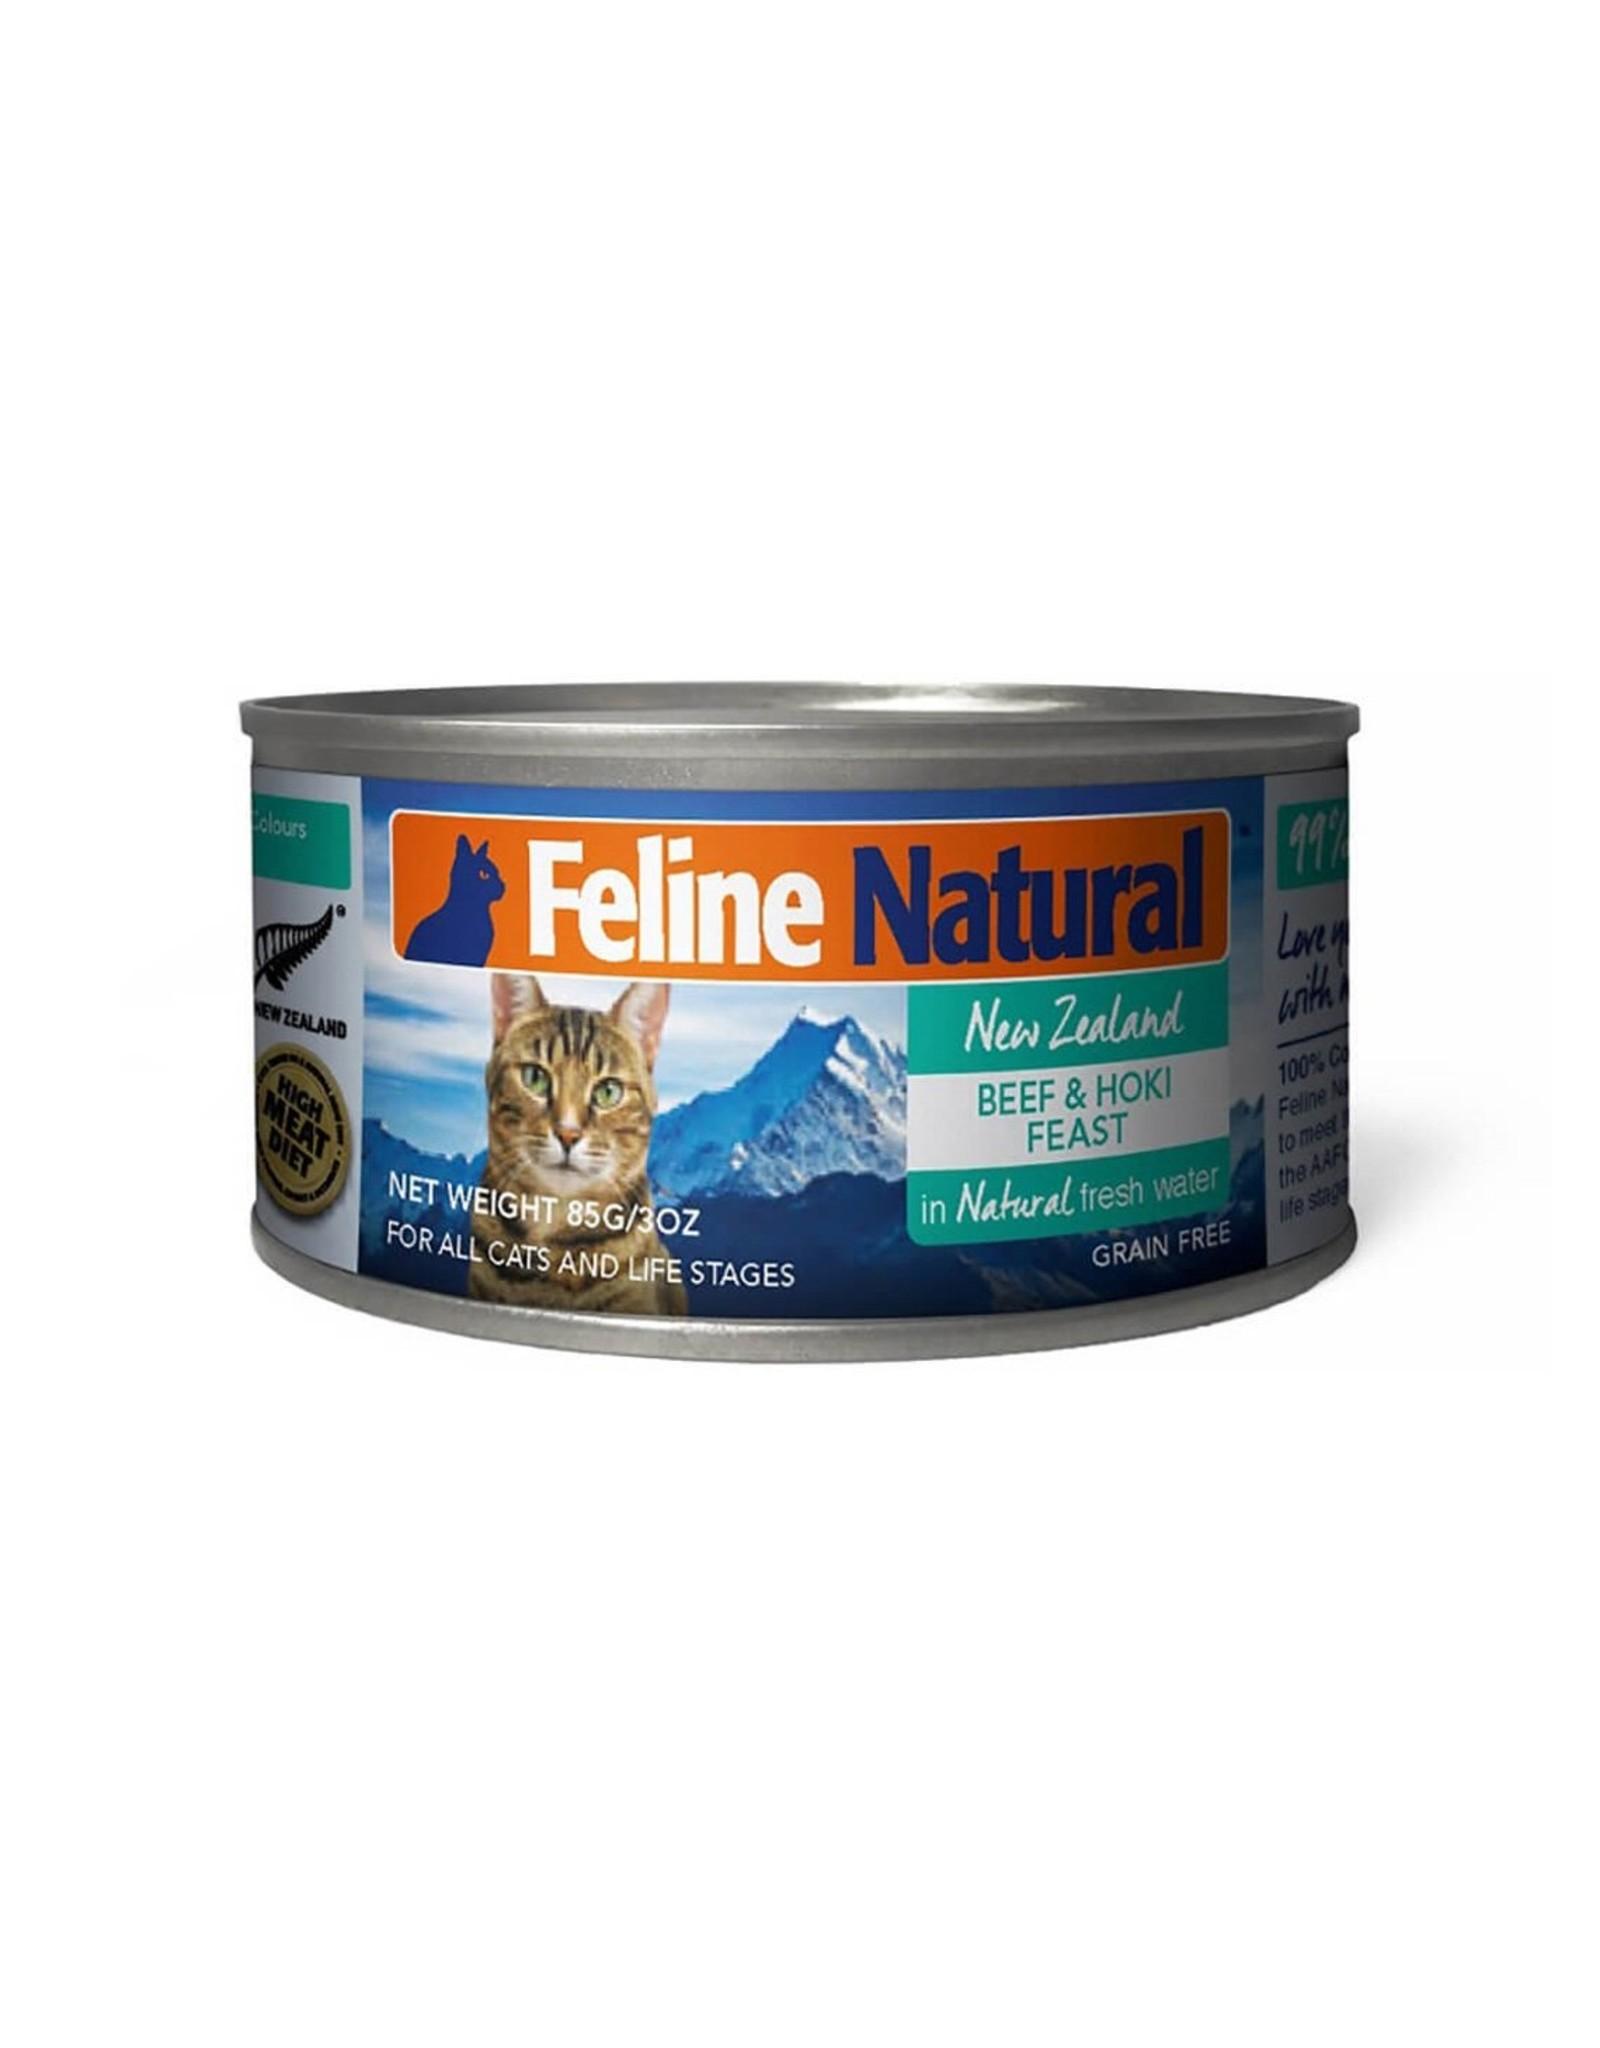 Feline Natural Feline Natural Beef and Hoki Feast